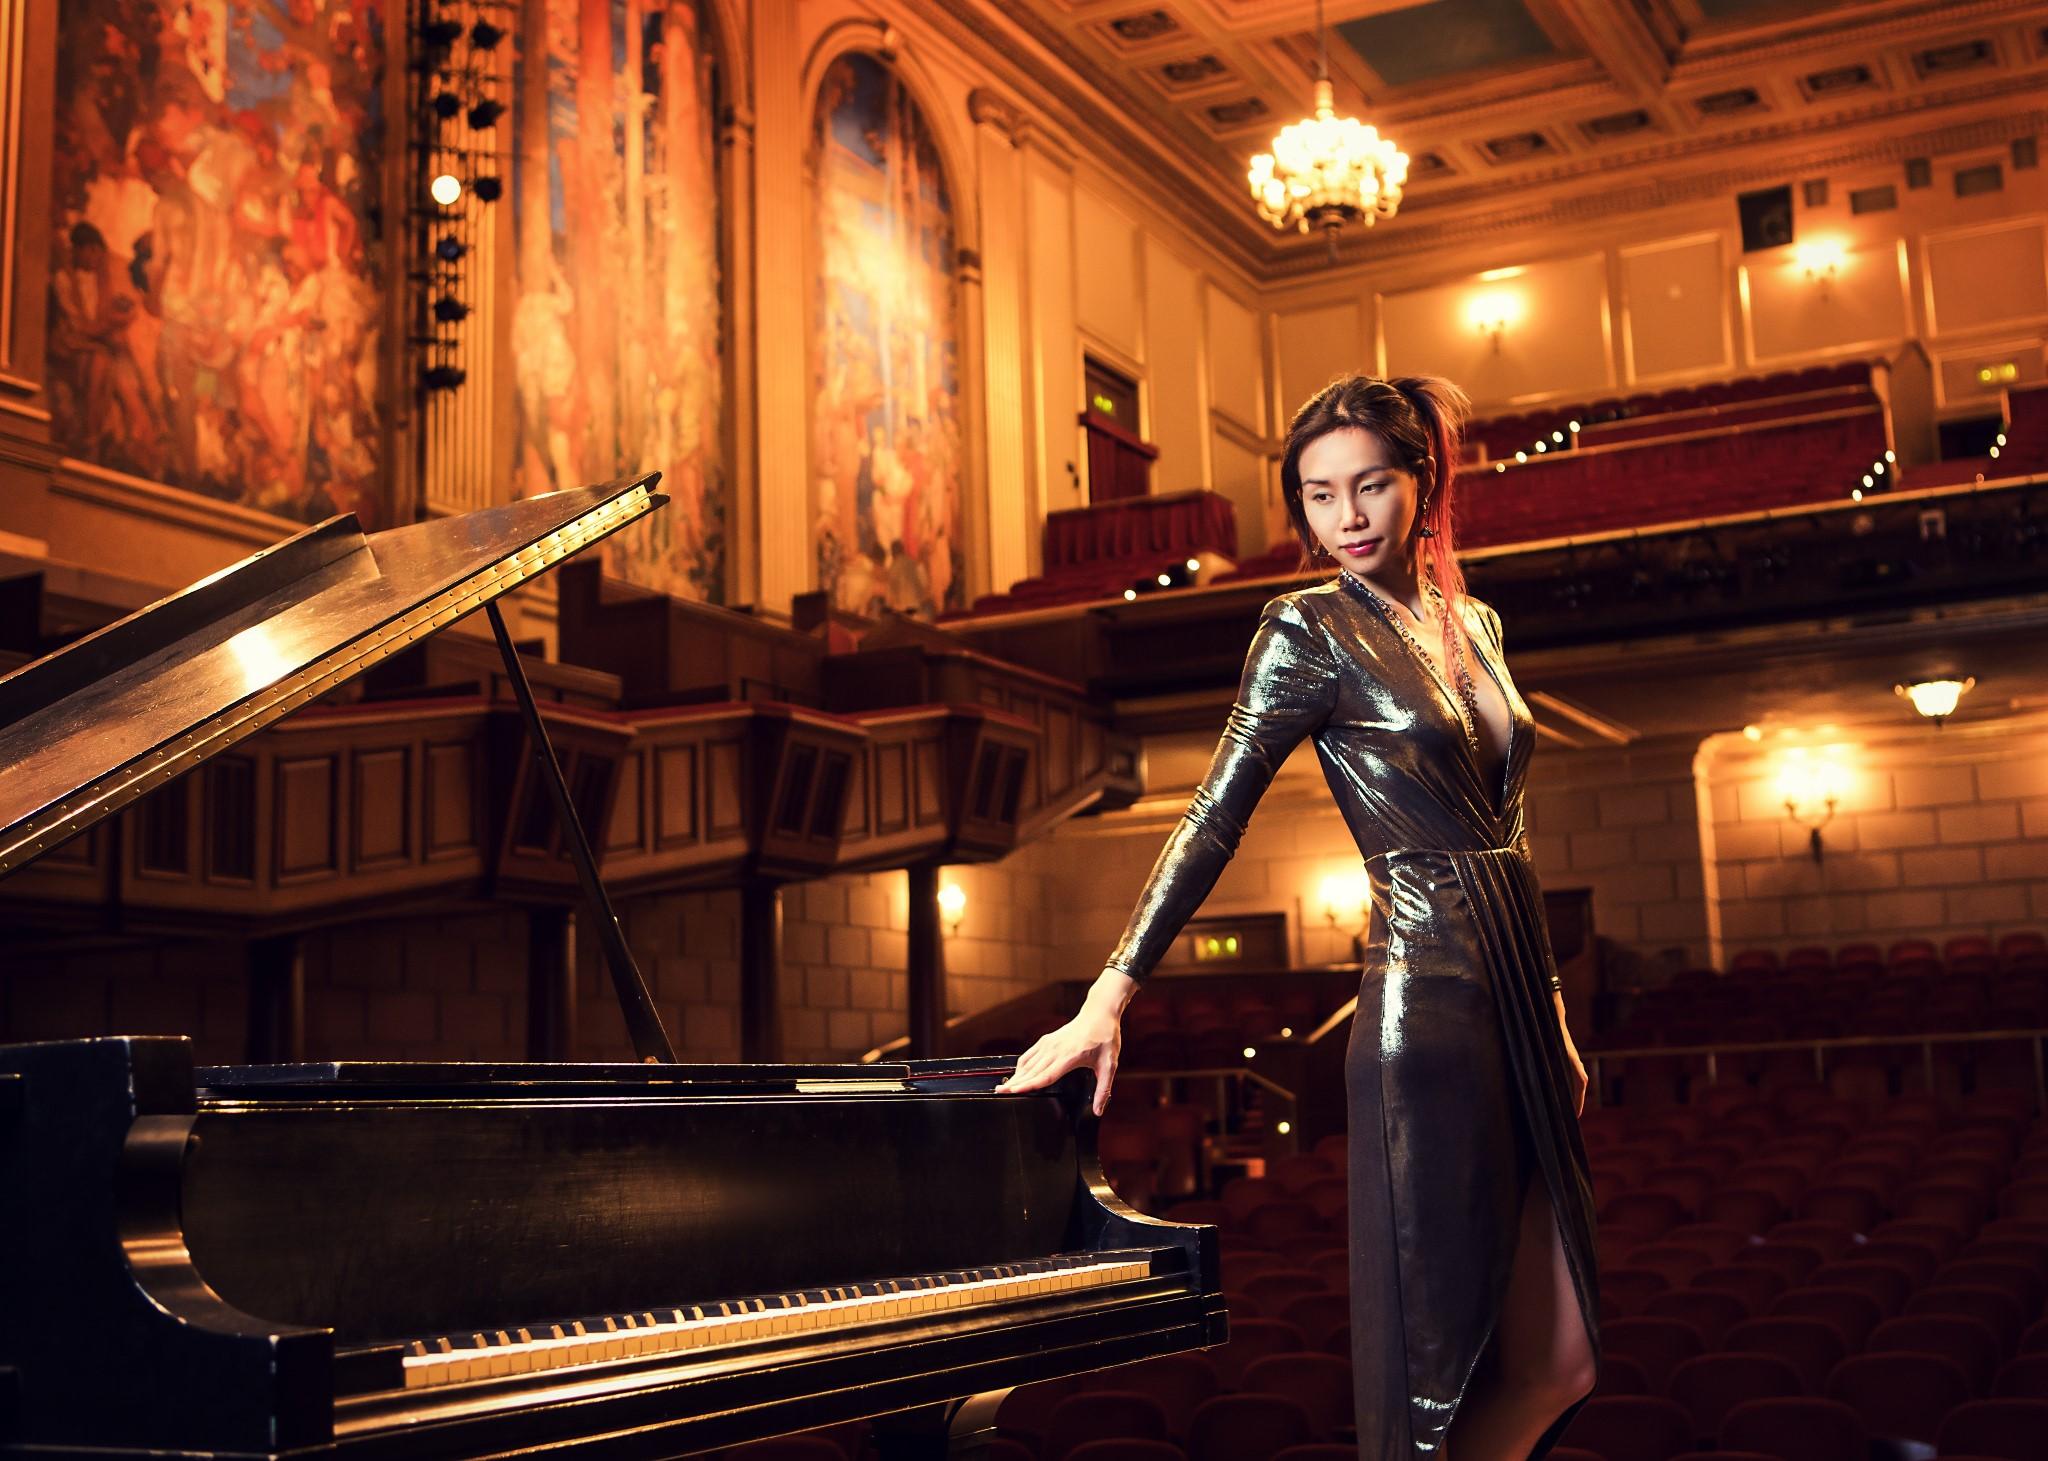 Serene, pianist